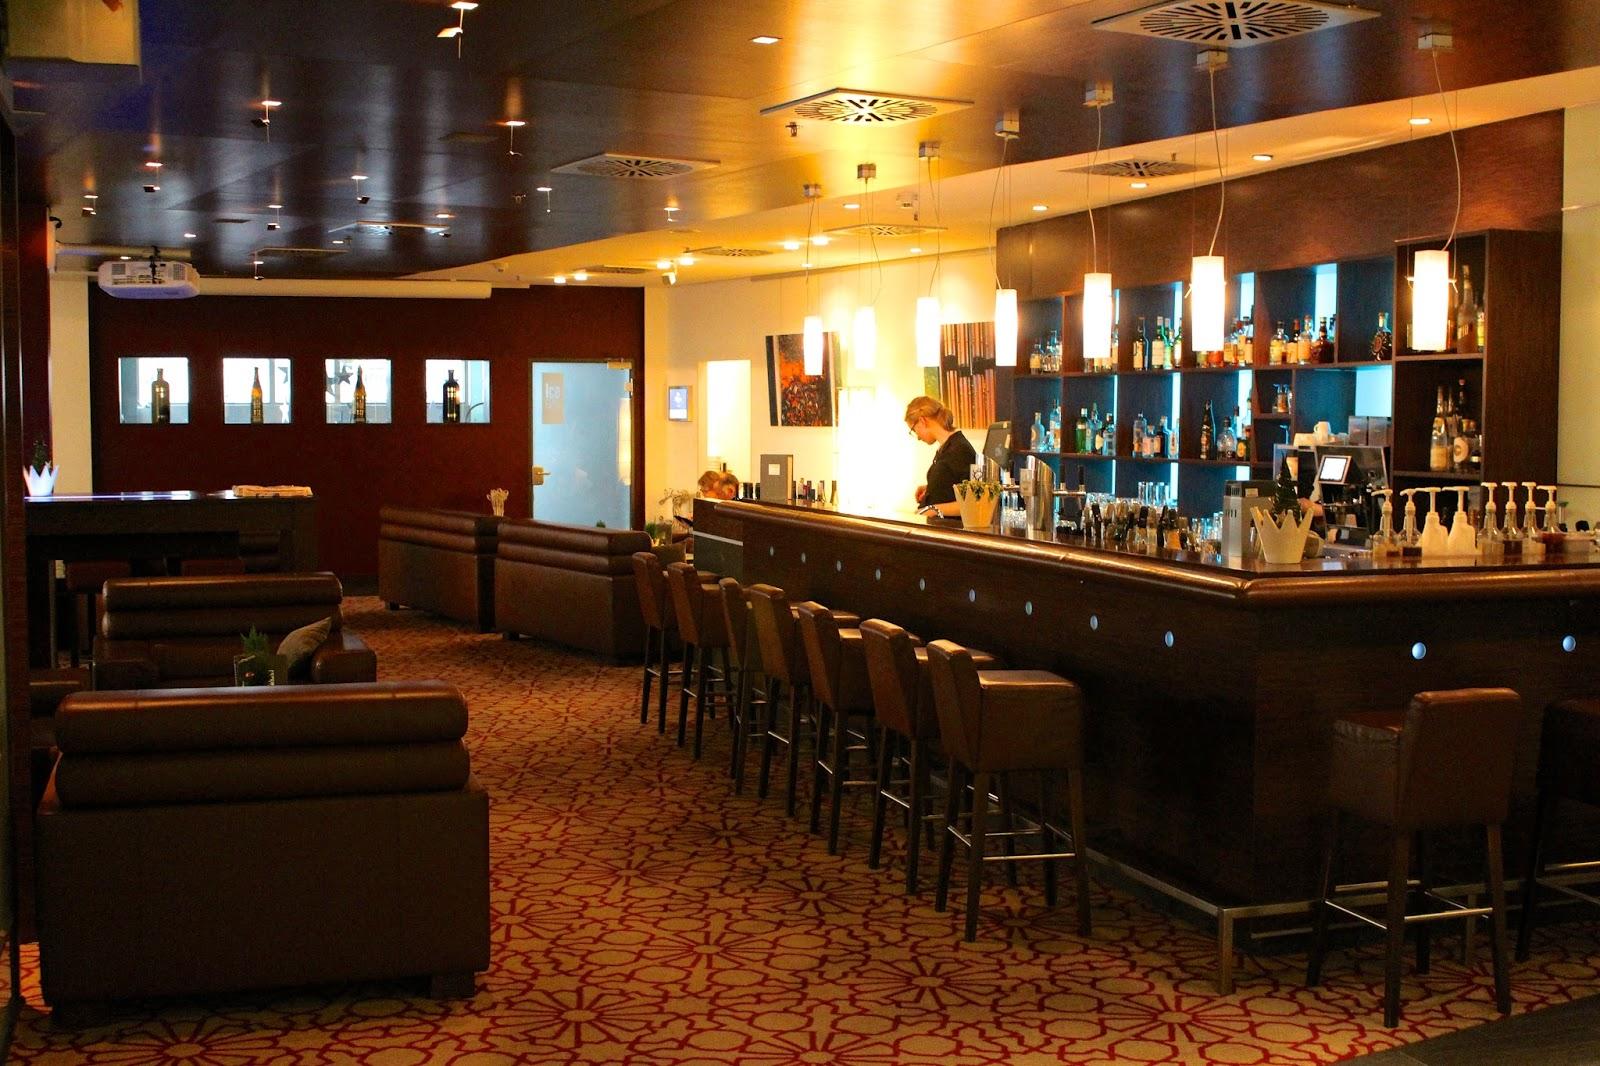 hilton hotel cologne bar area